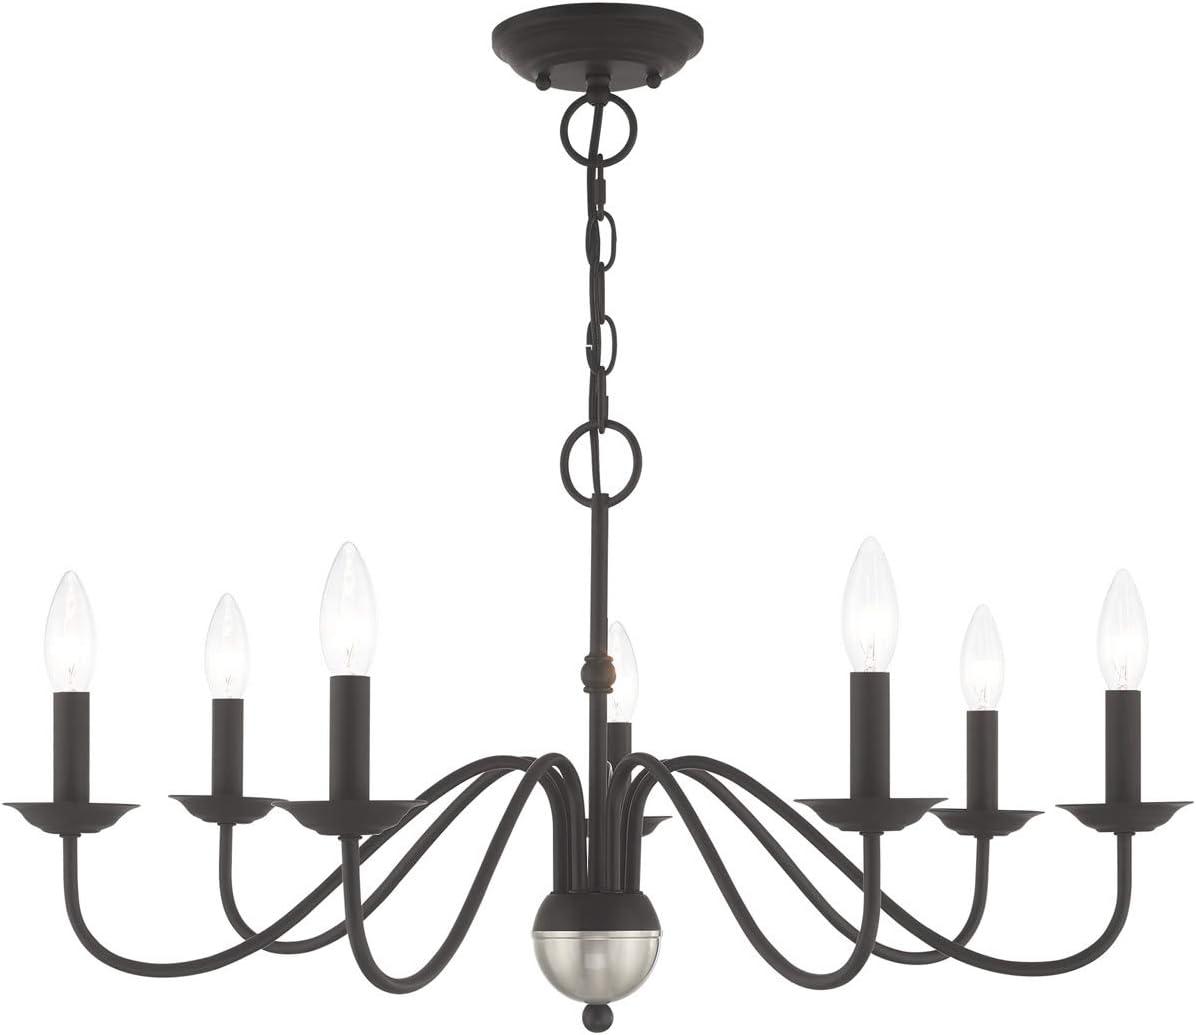 Chandeliers 7 Light Fixtures with Black Finish Steel Material Candelabra 16 420 Watts